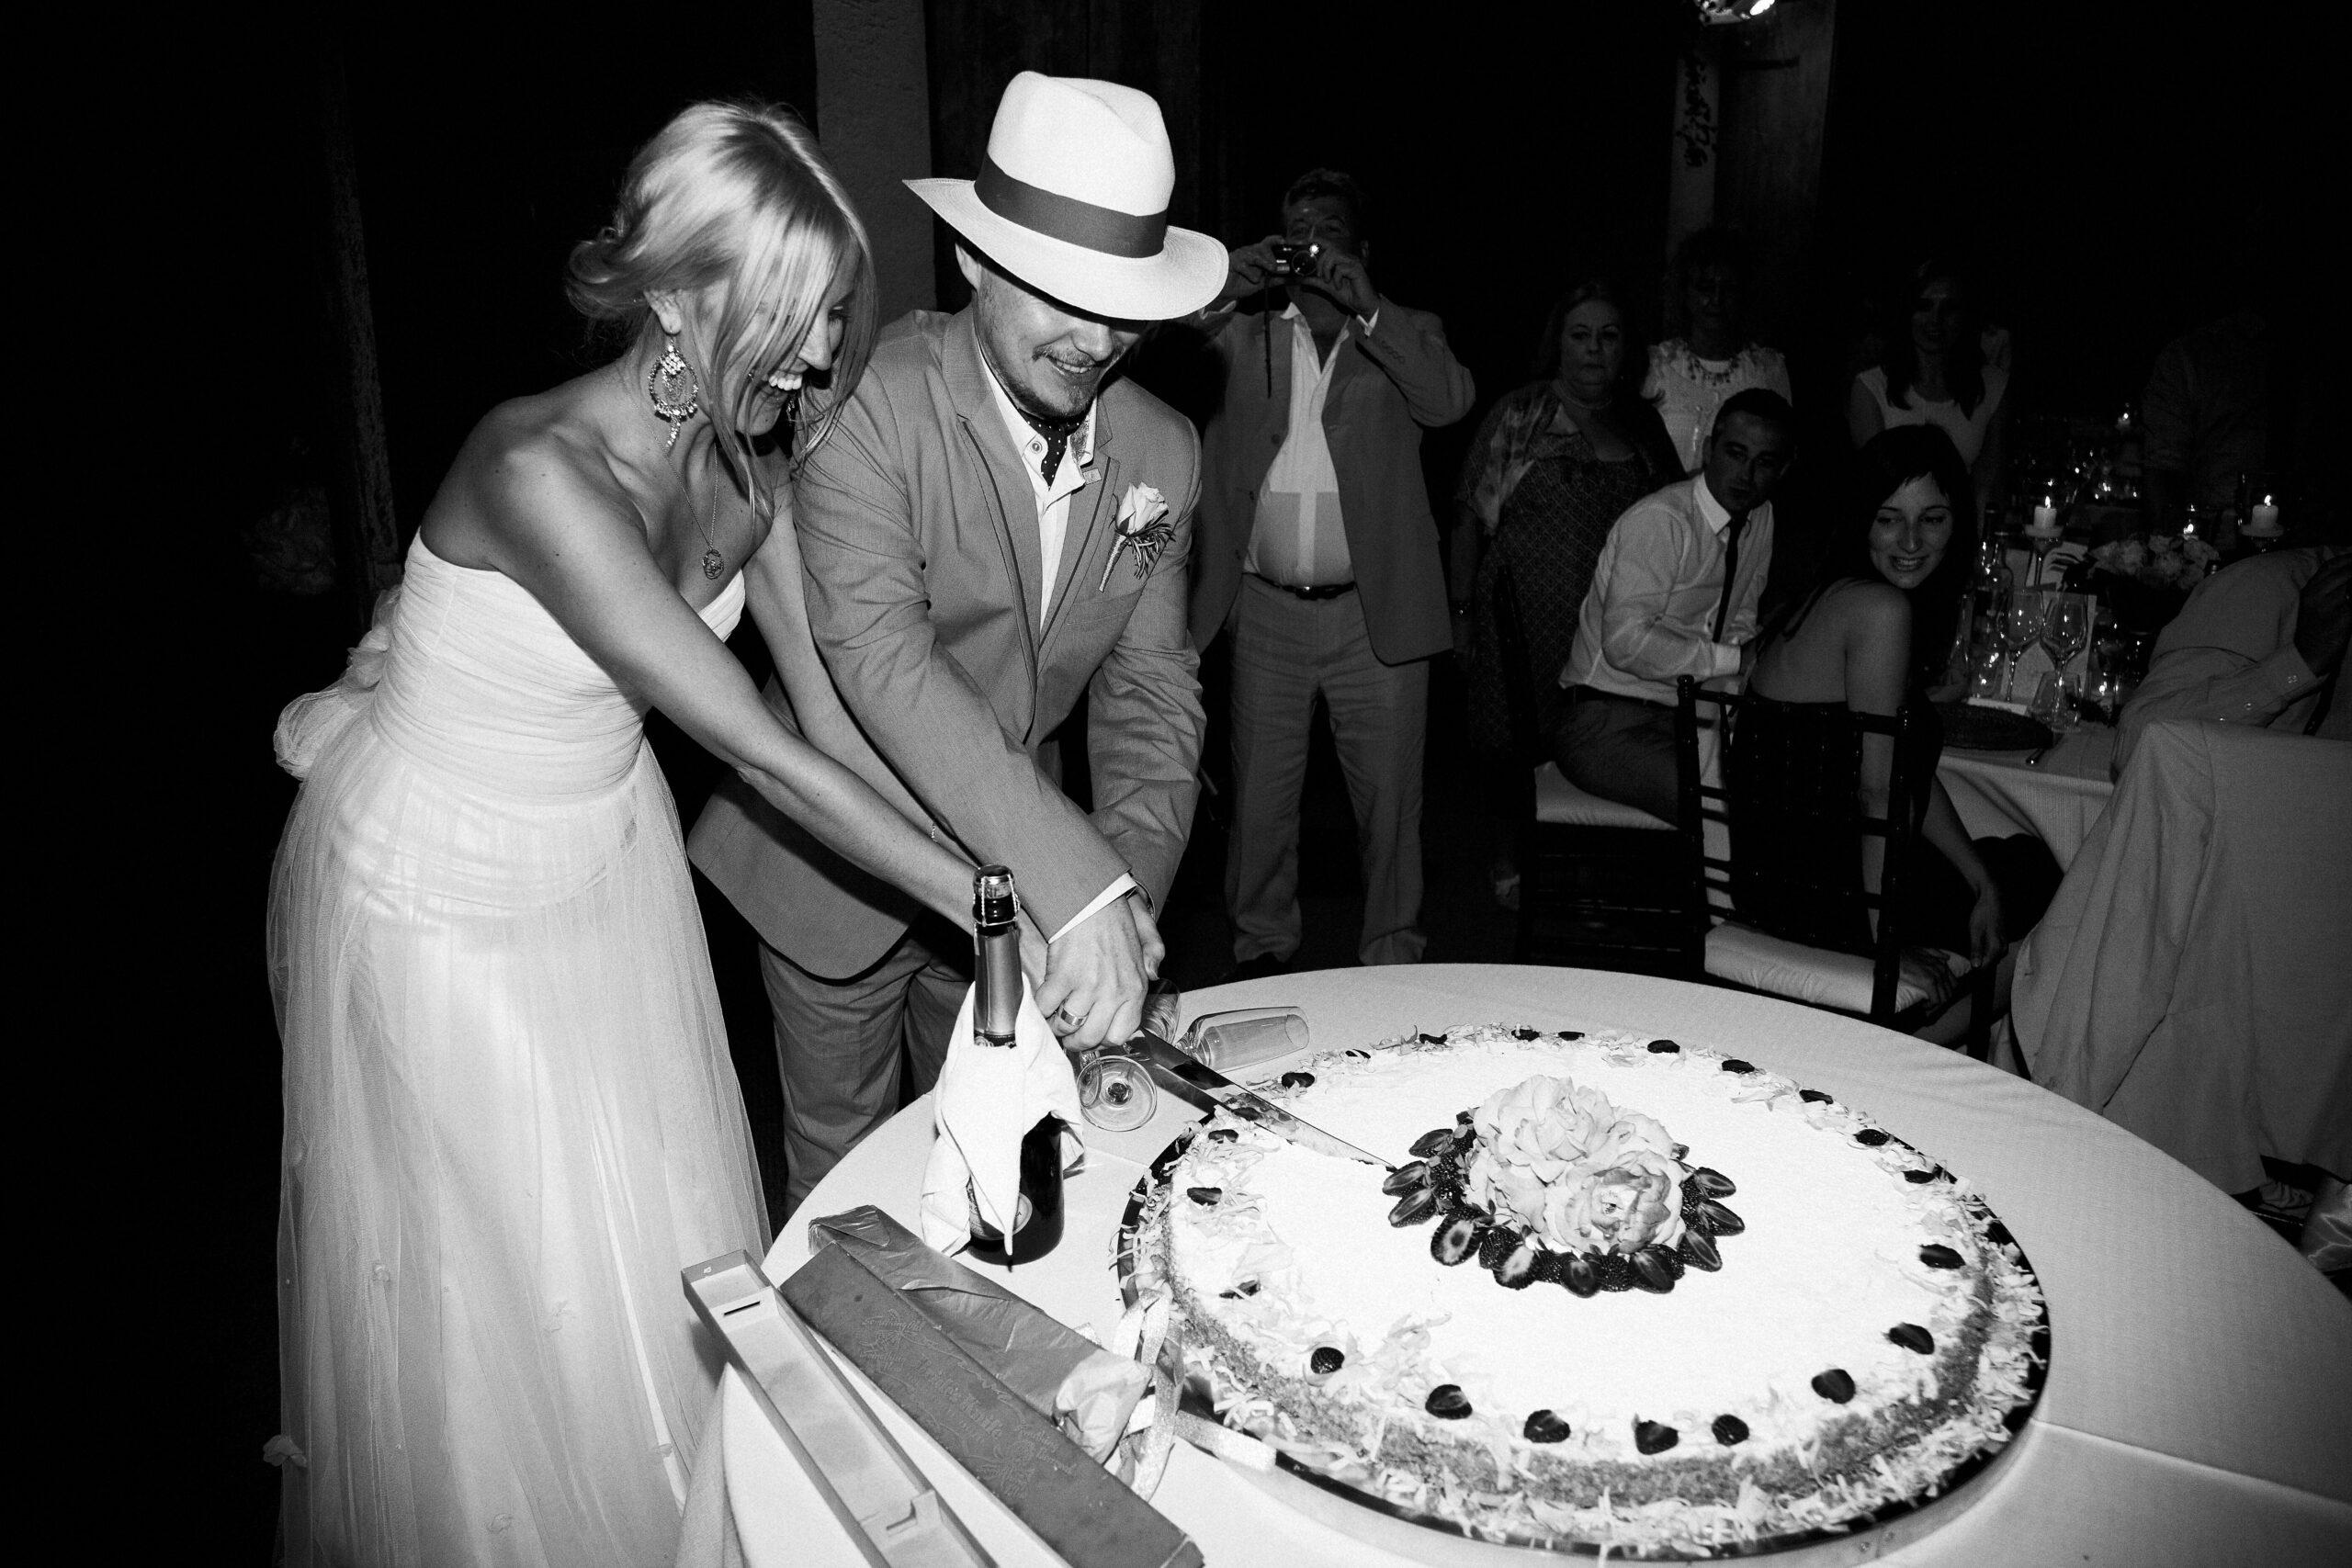 Typical Italian wedding cake